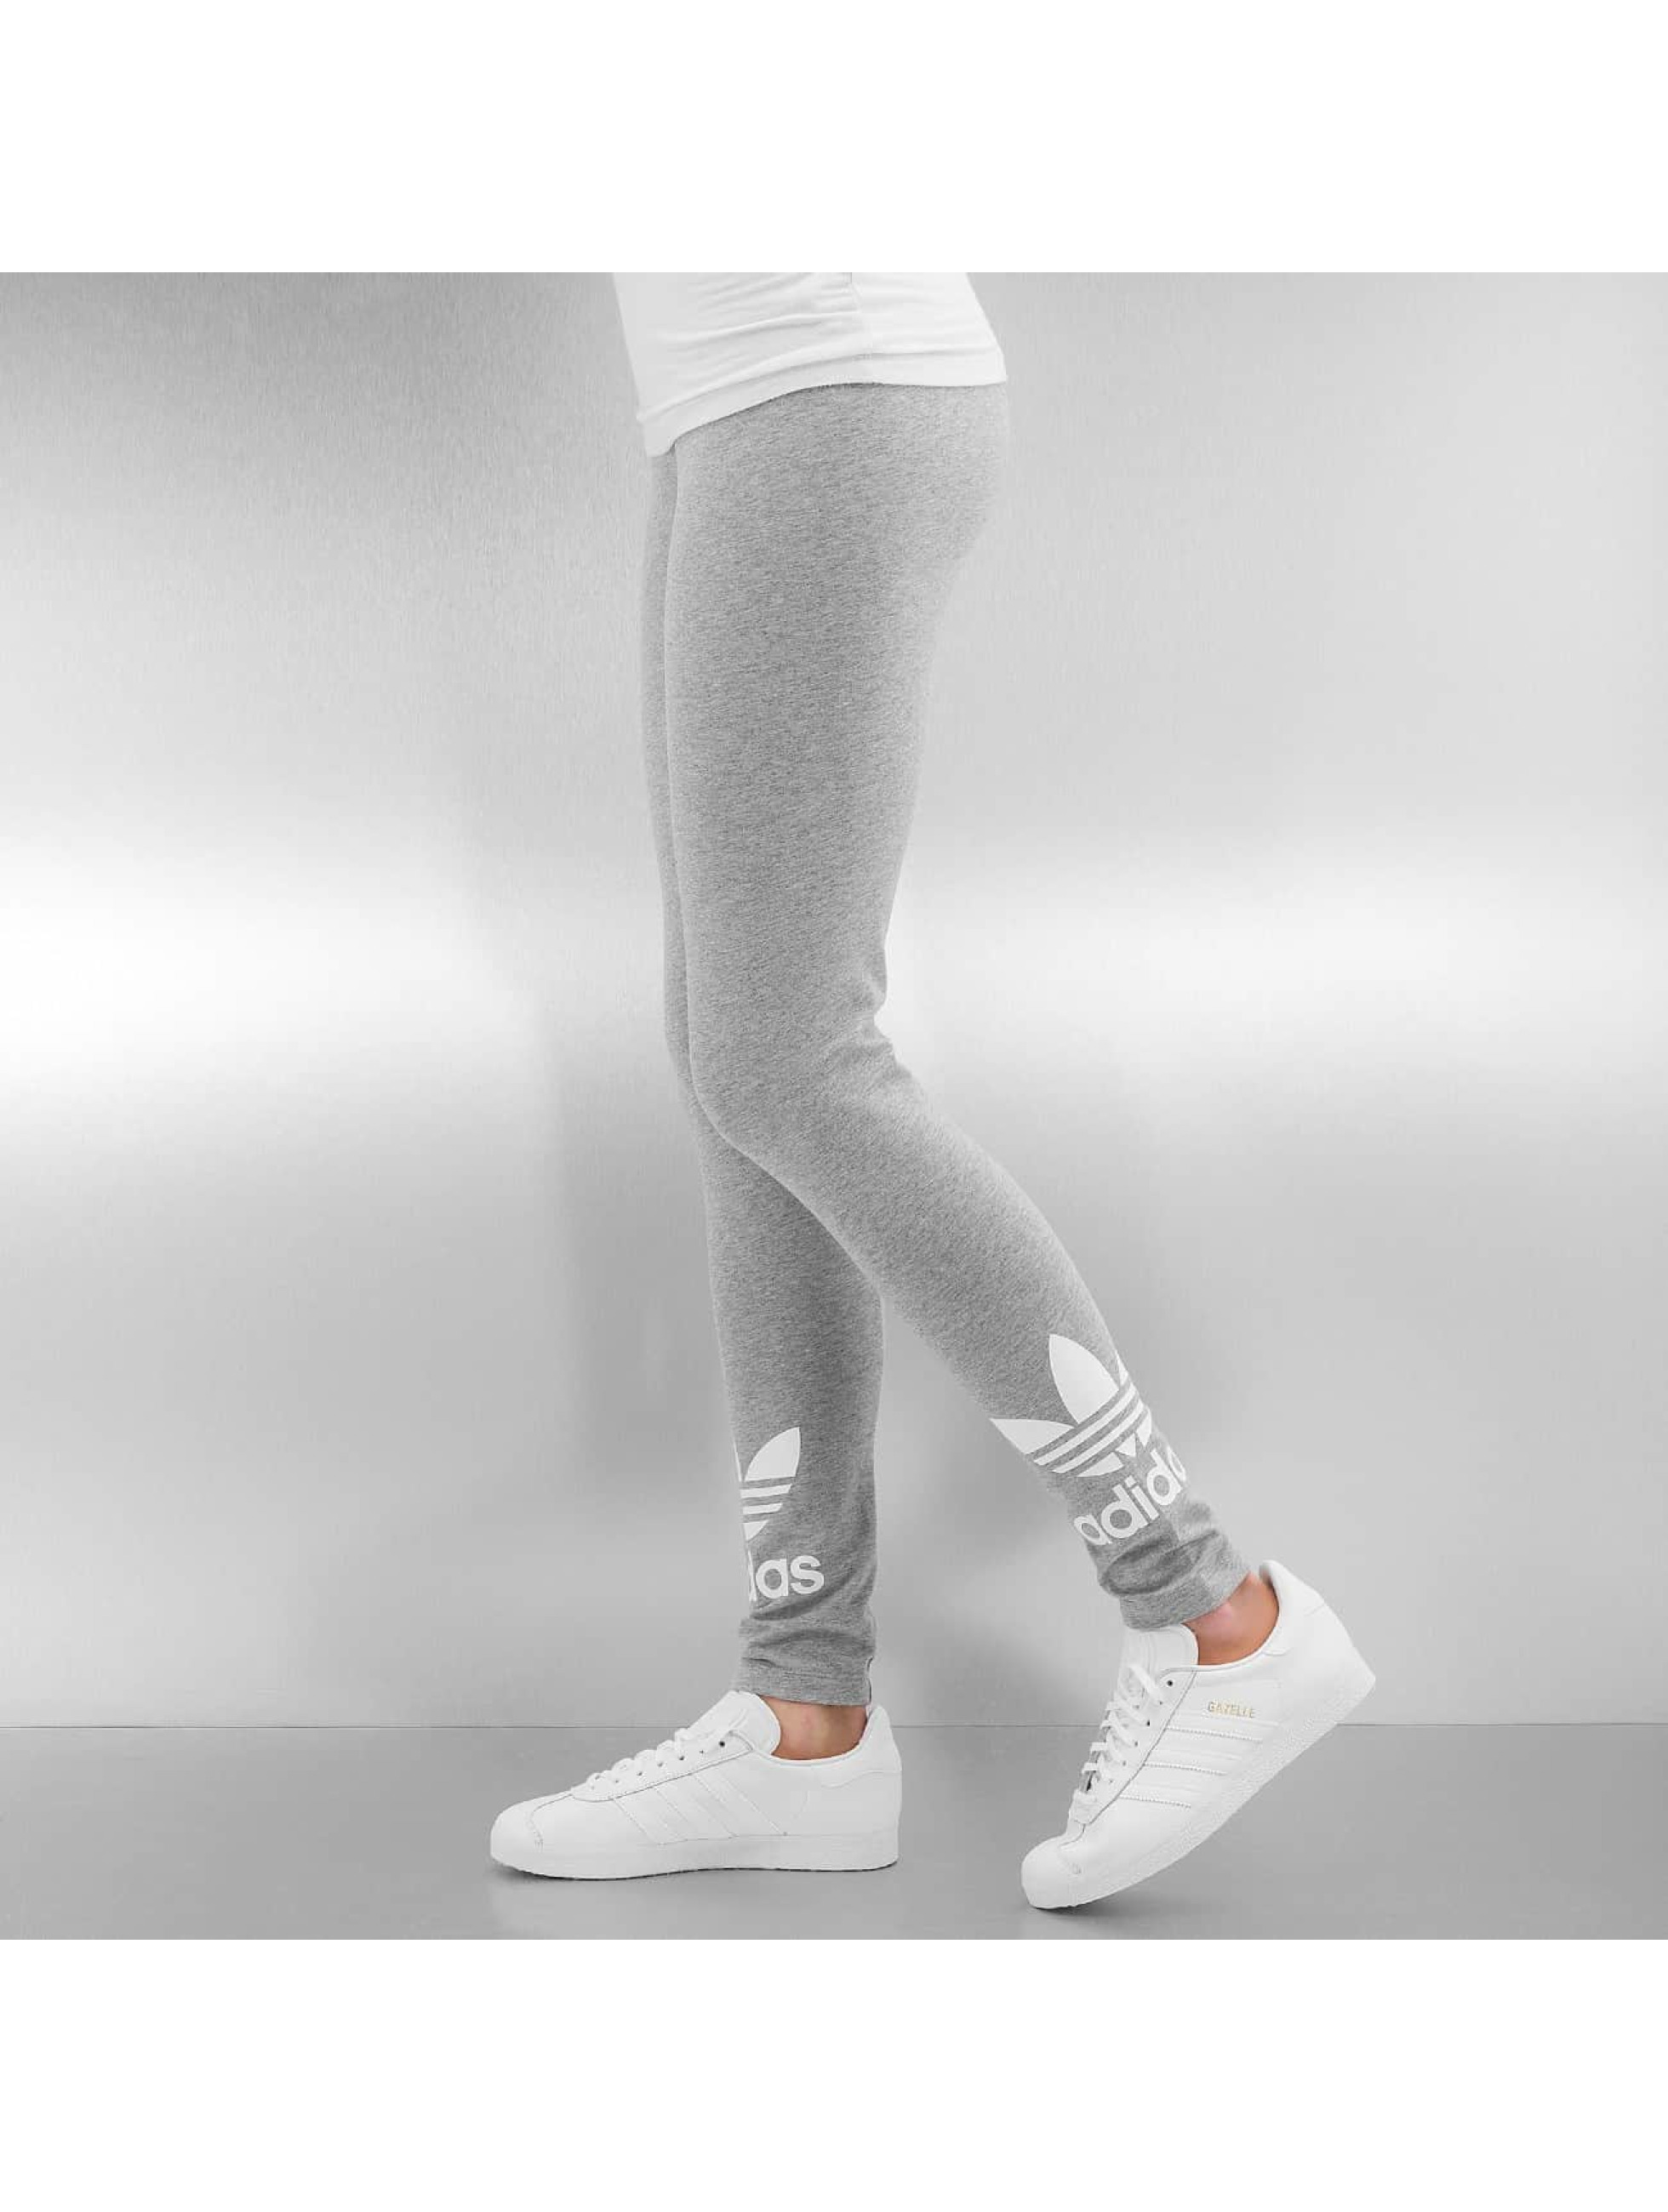 adidas trefoil gris femme legging adidas acheter pas cher pantalon 302621. Black Bedroom Furniture Sets. Home Design Ideas